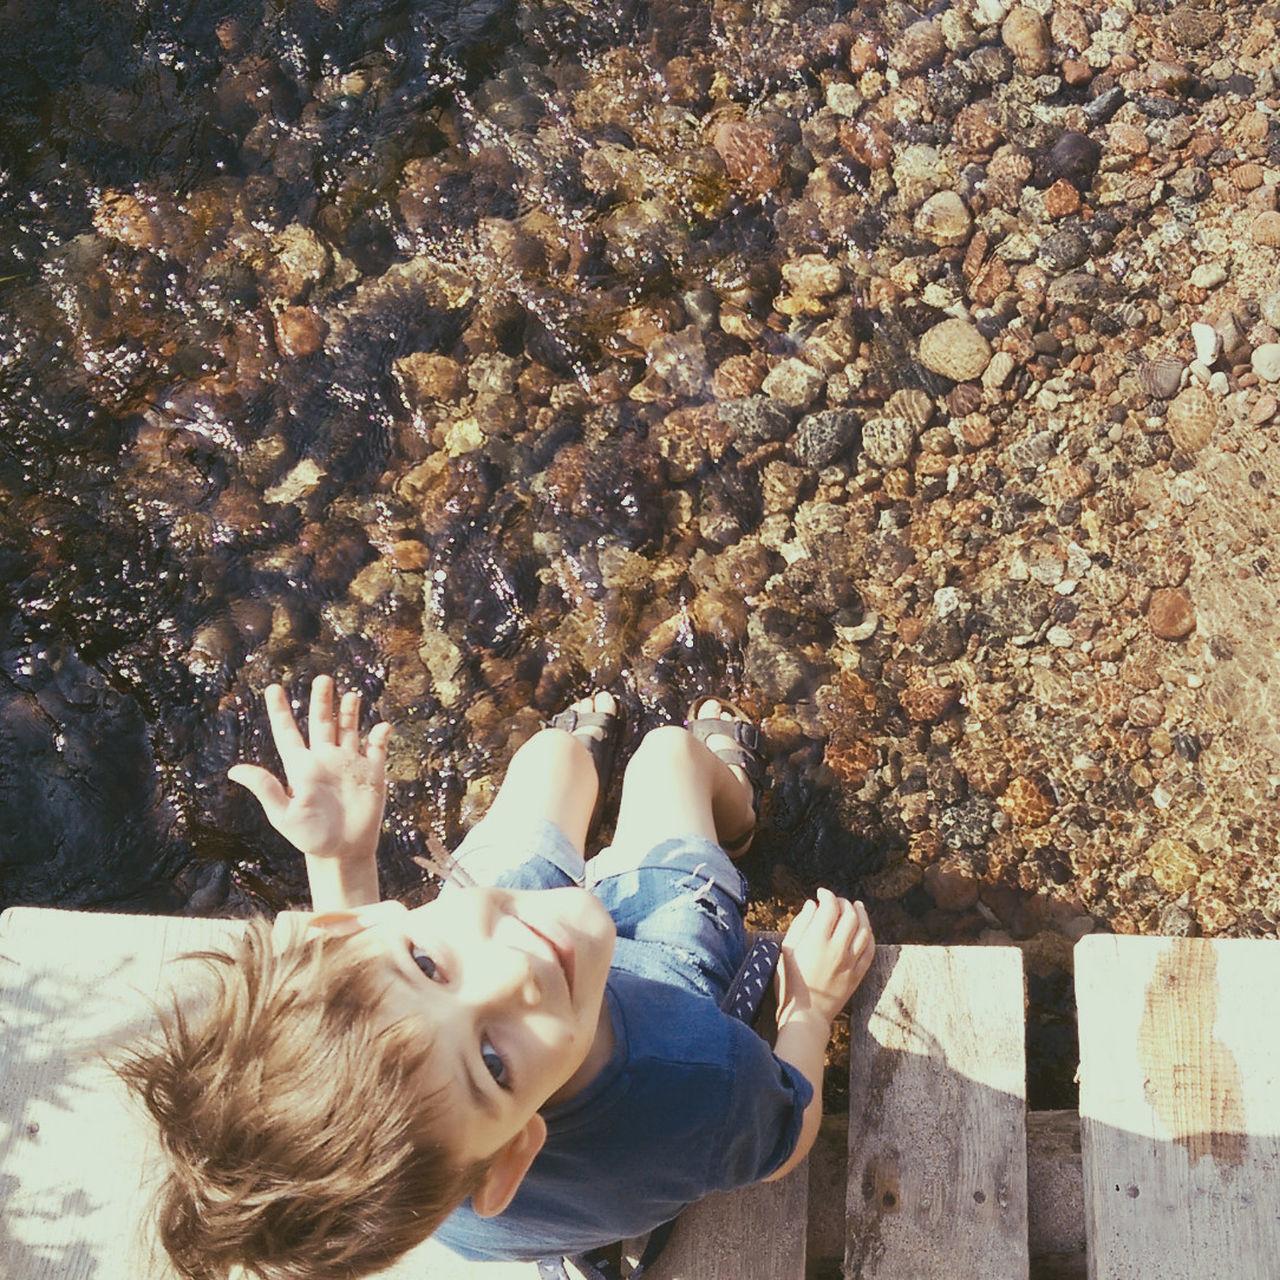 Child River Rocks Rocks And Water Bridge